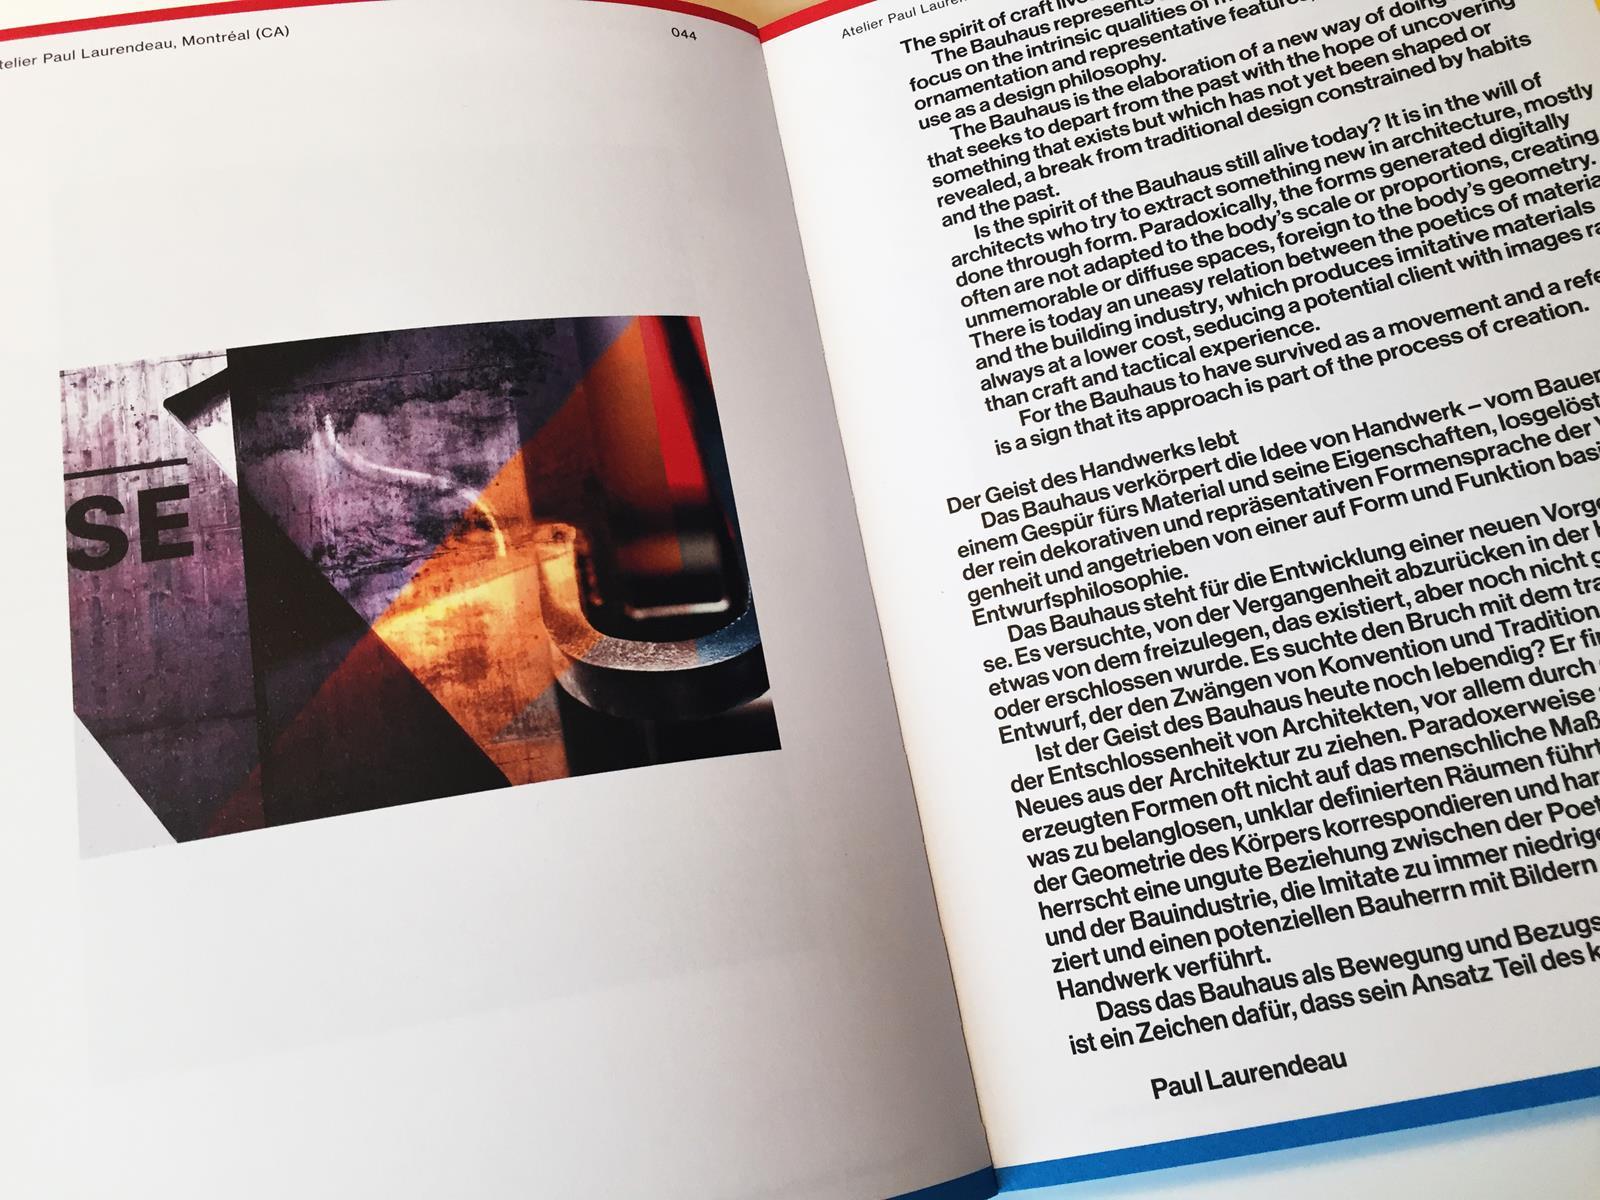 My Bauhaus - Publication photo_02_1600x1200.jpg